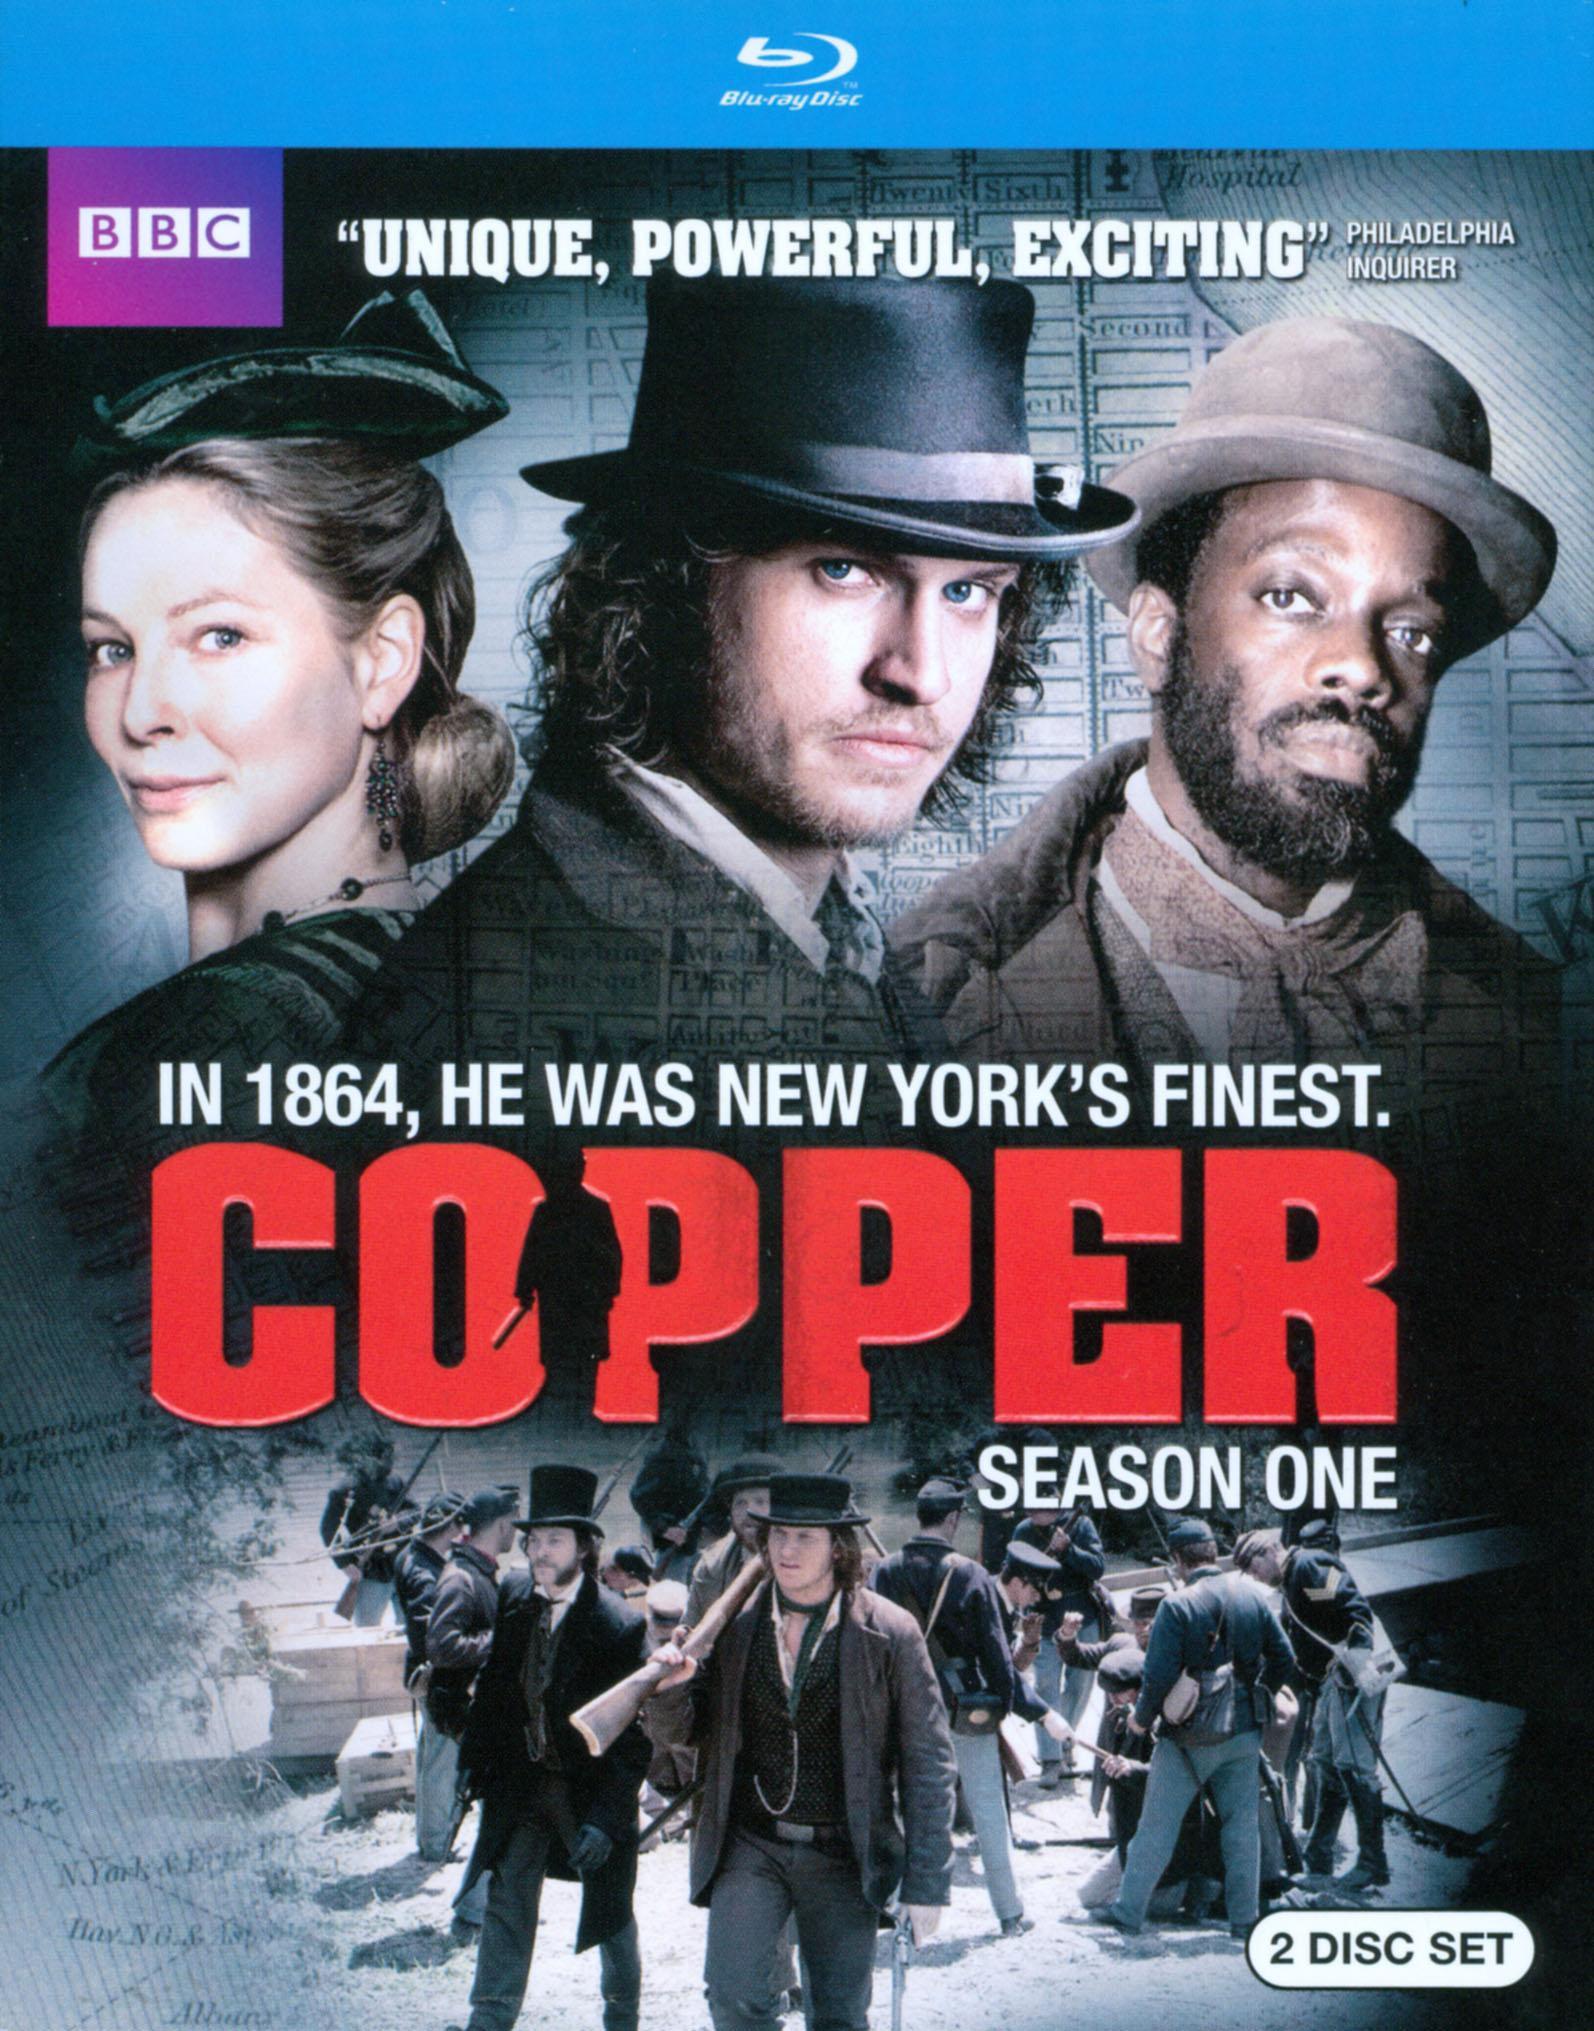 Copper: Season One [2 Discs] [includes Digital Copy] [ultraviolet] [blu-ray] 6819569